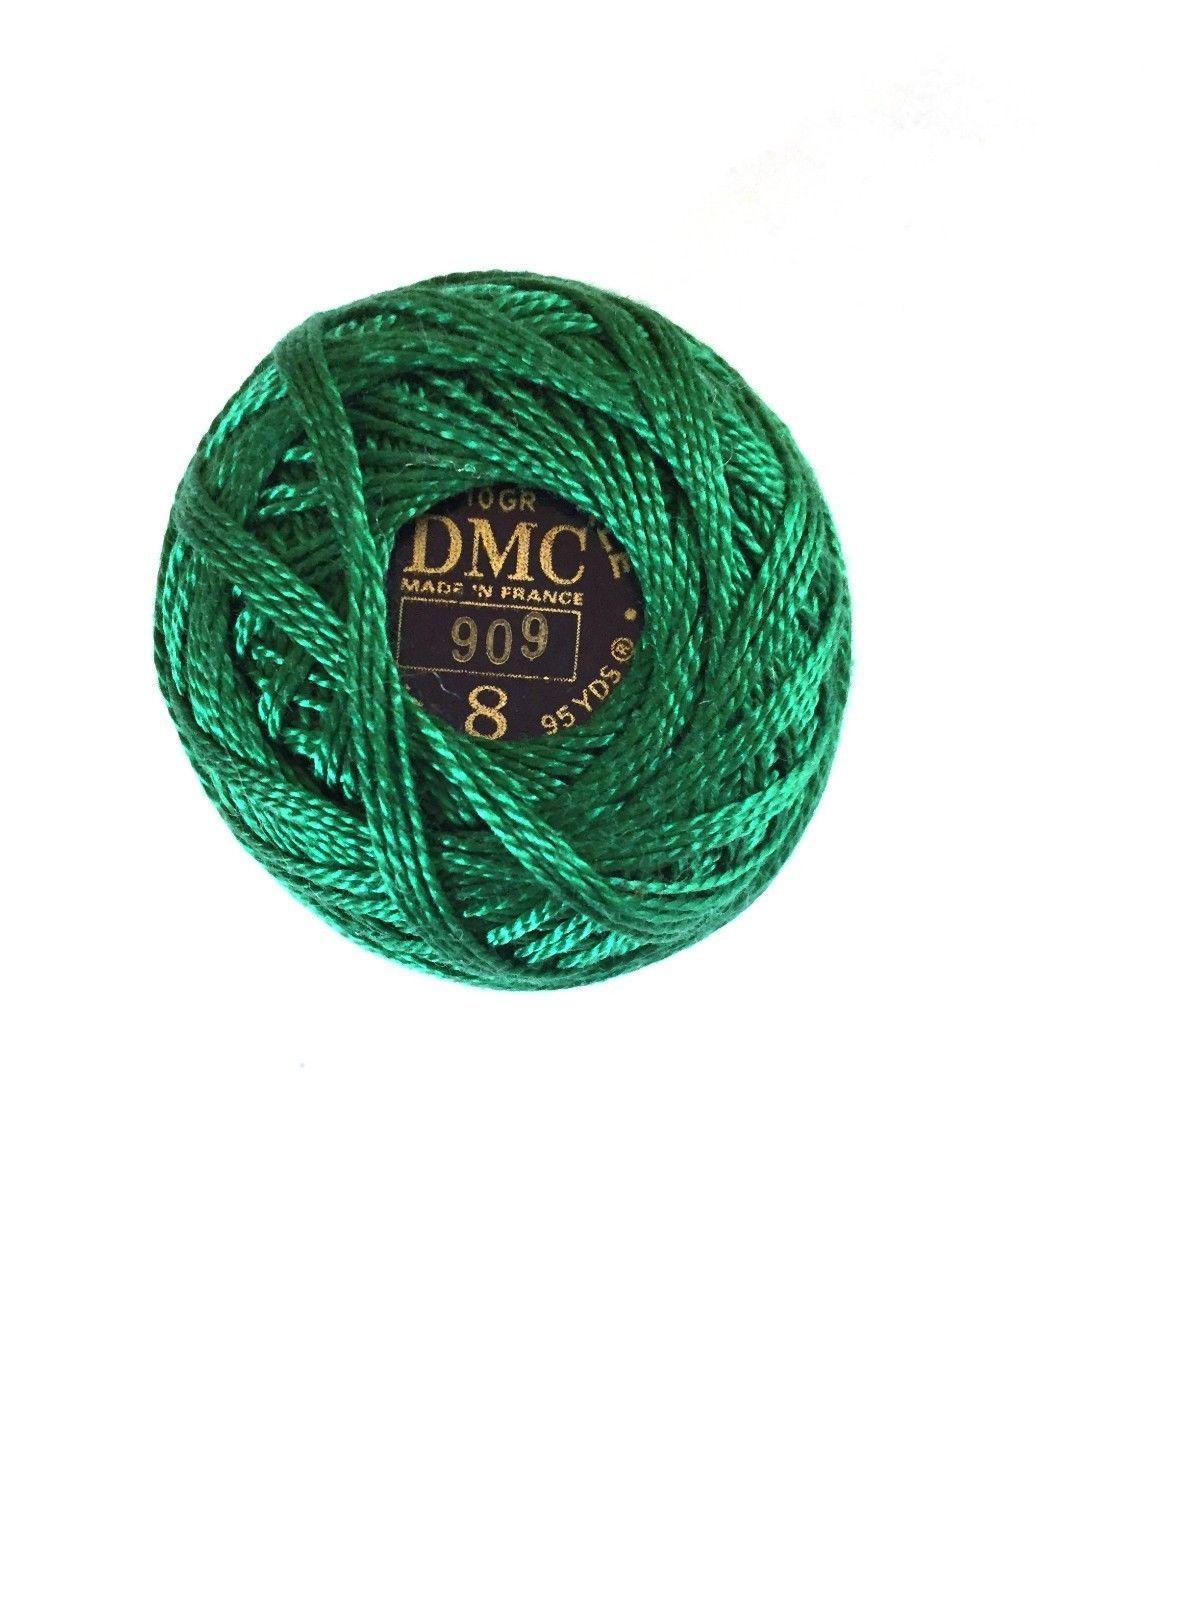 DMC Pearl Cotton Green #909 Coton Perle - $2.70